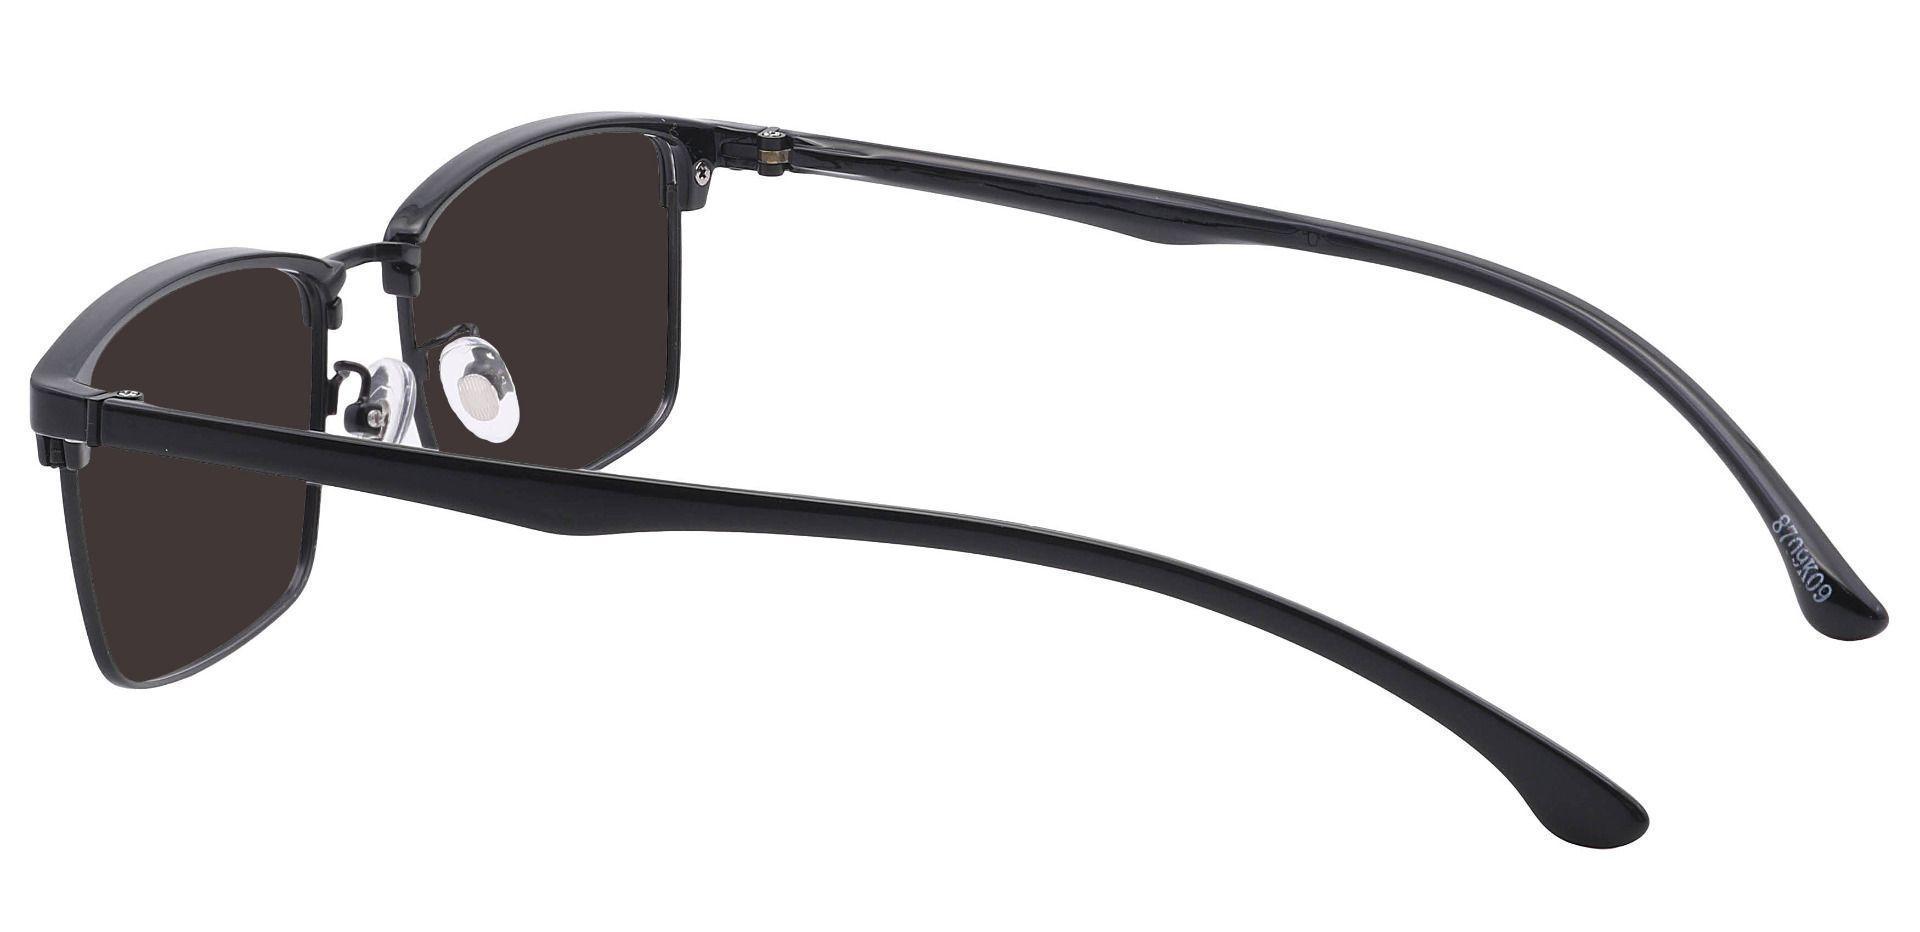 Young Browline Prescription Sunglasses - Black Frame With Gray Lenses